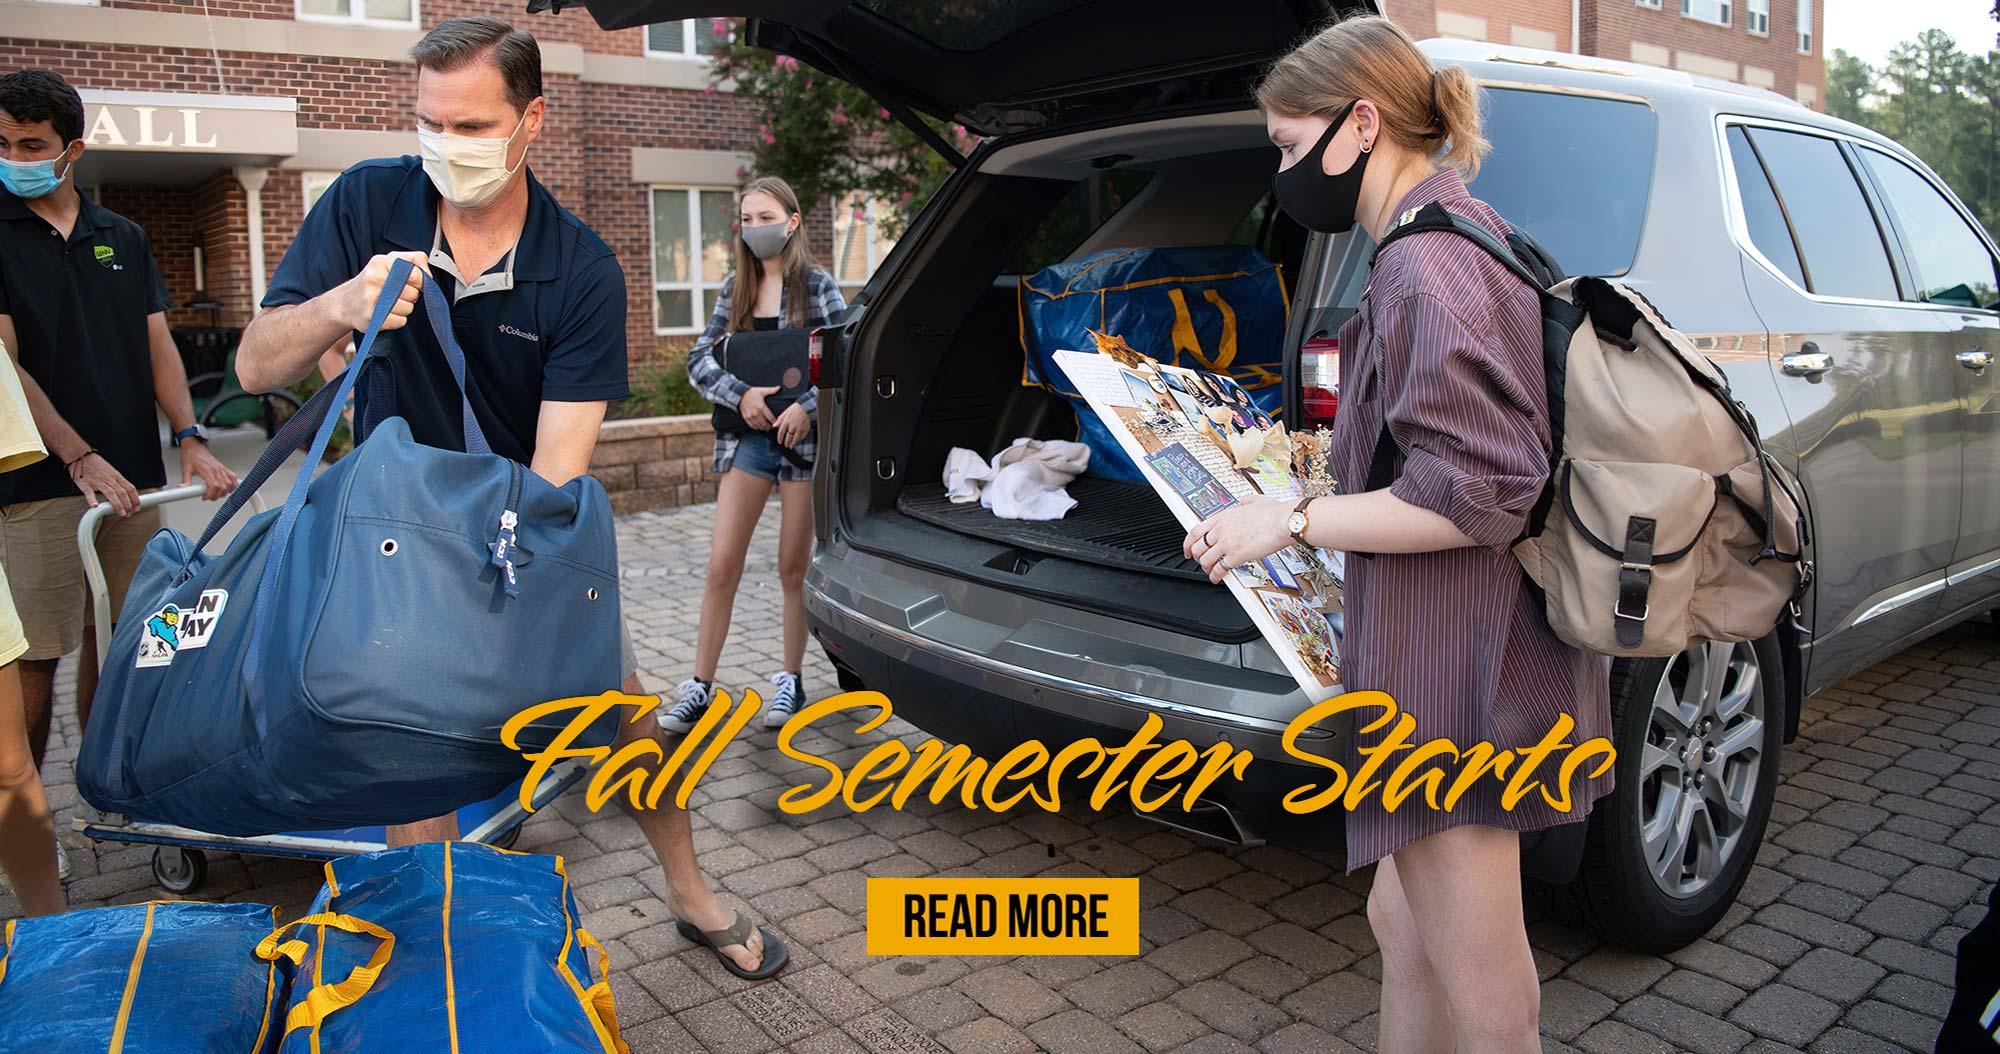 Fall Semester Starts